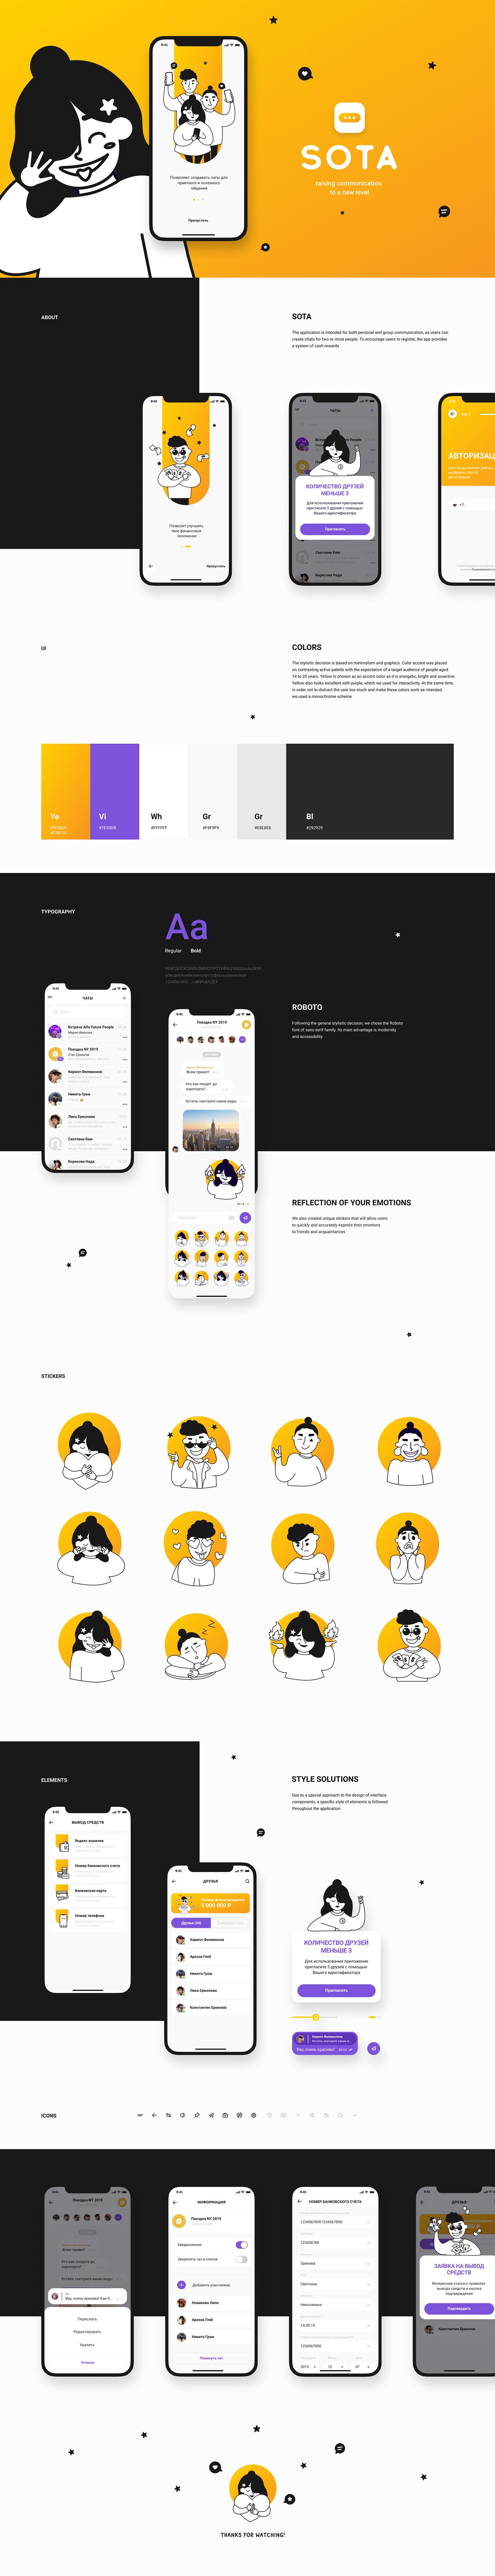 Appdesign mobile Webdesign UI ux productdesign Interface UI/UX ui design design